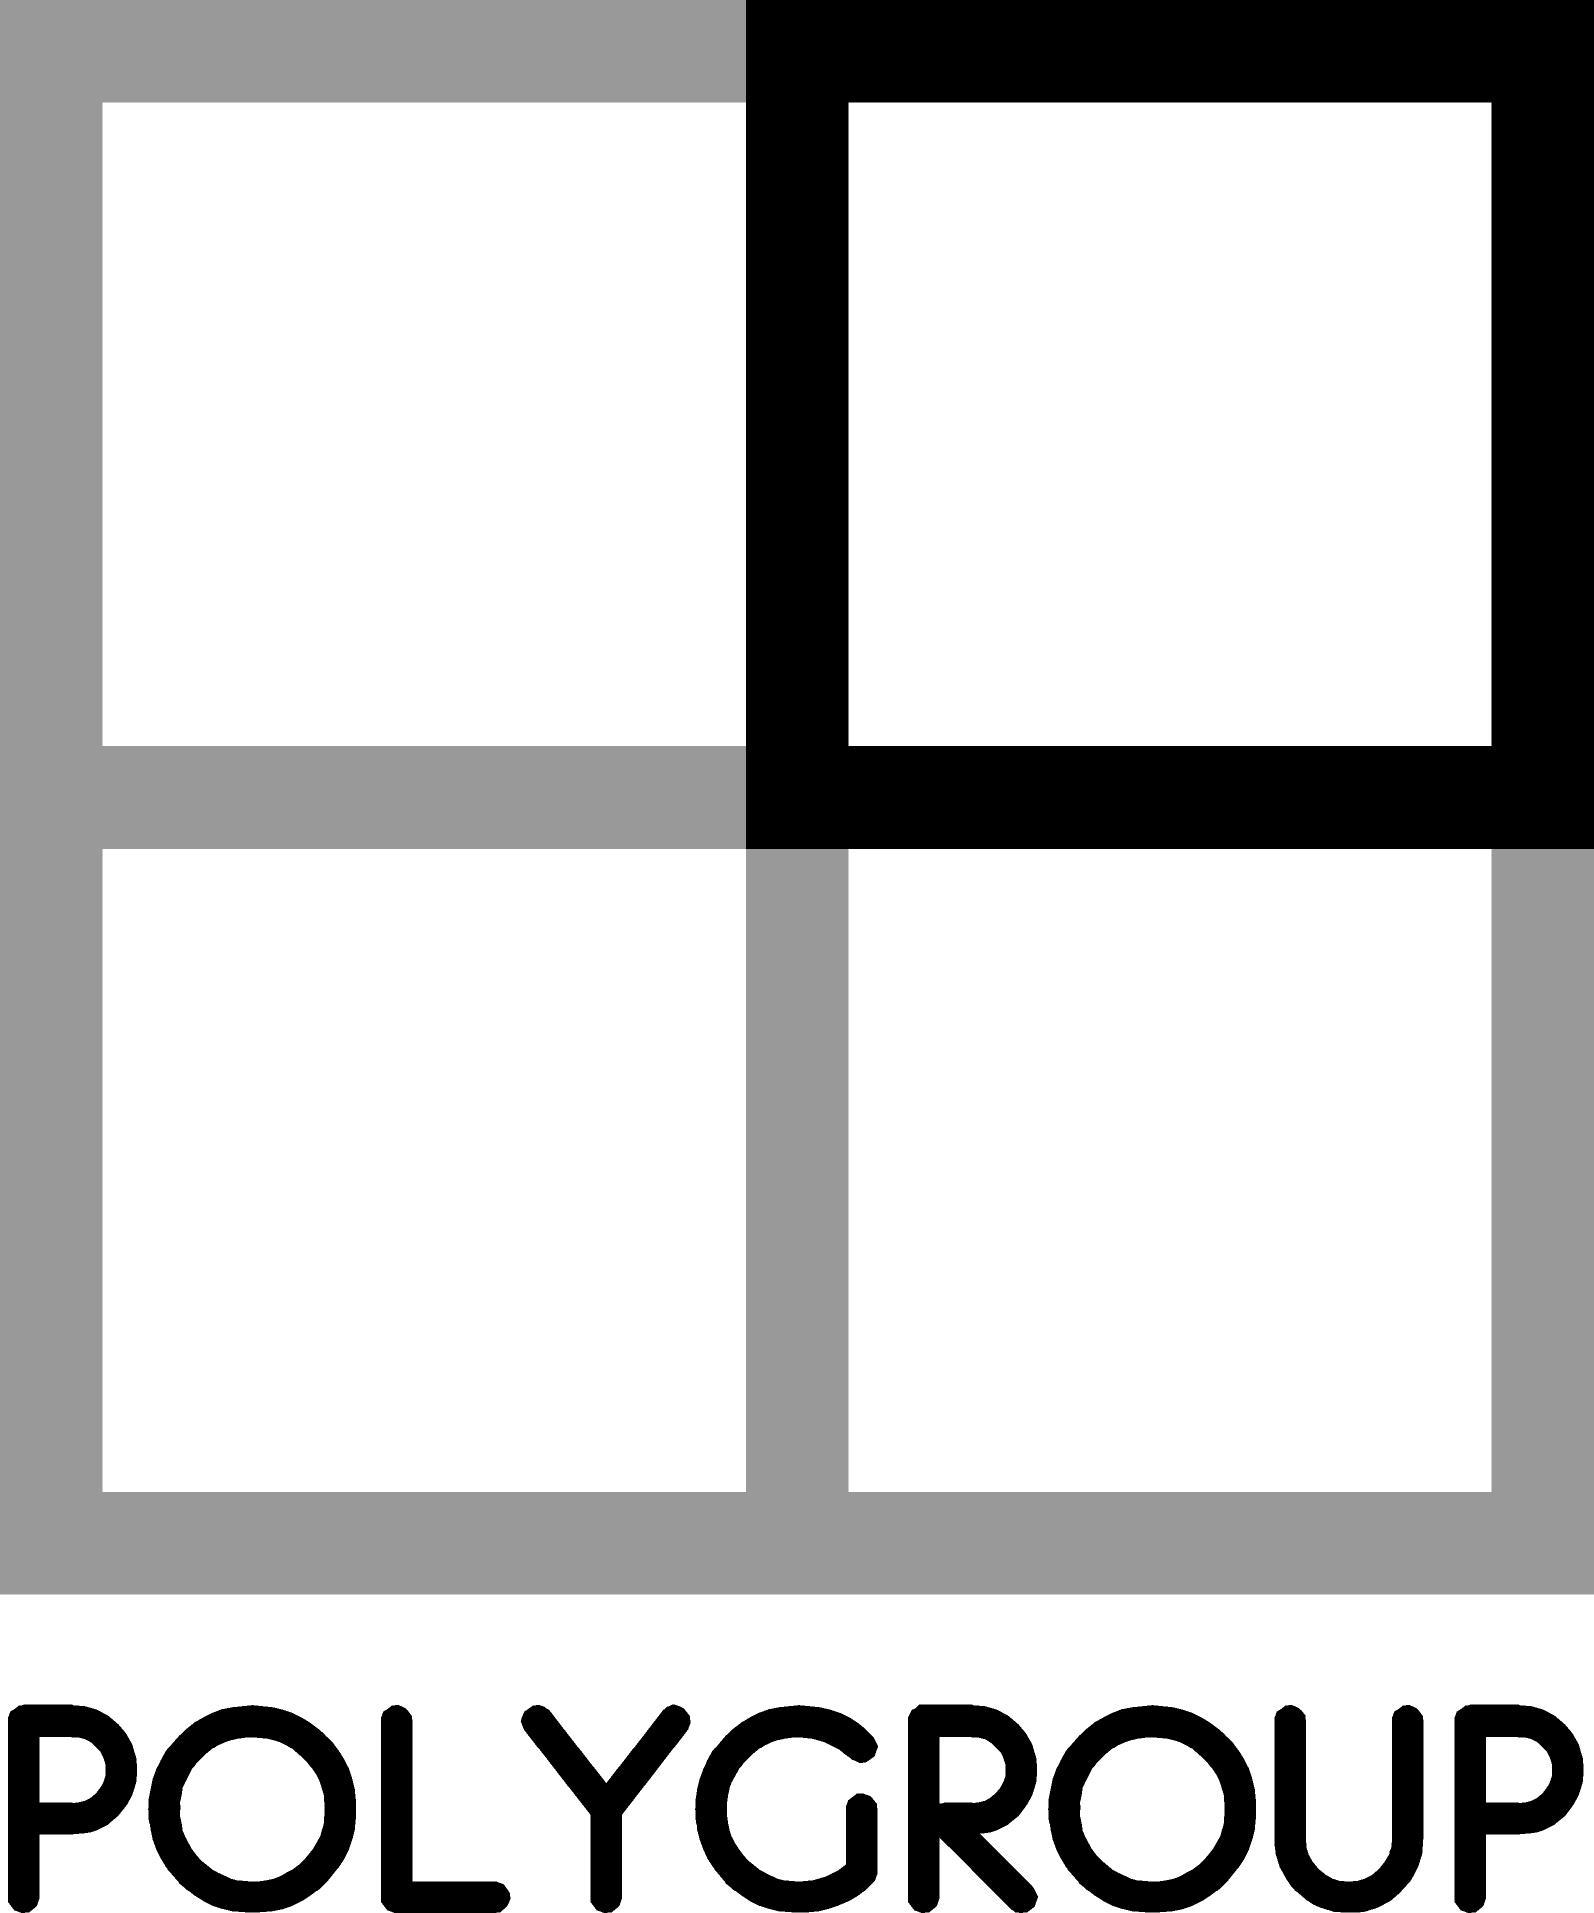 Raised Access Floor Polygroup logo